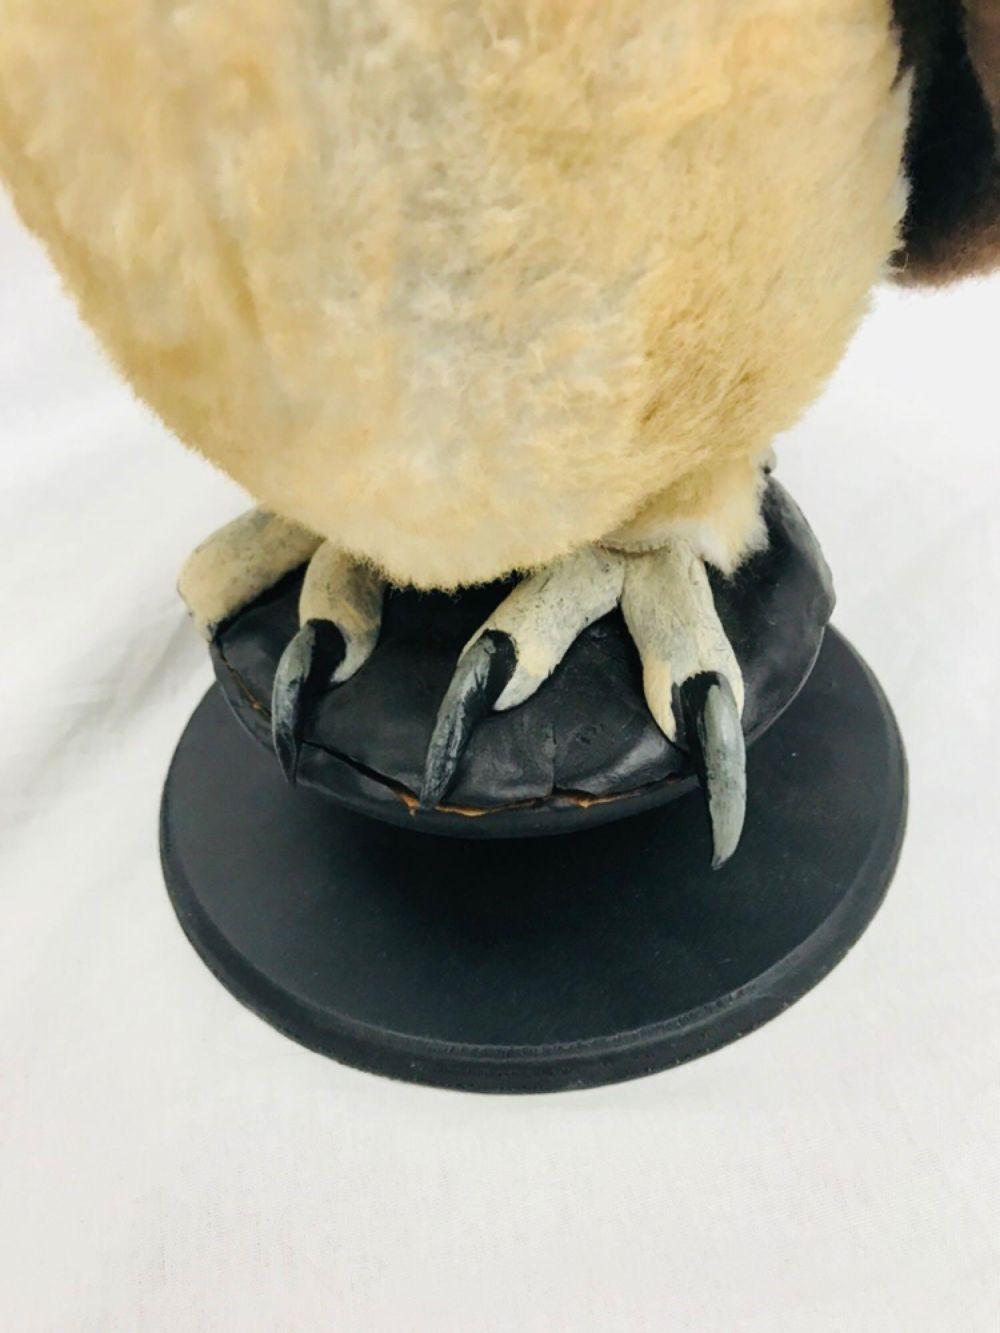 Lot 986: Halloween Decor, Plush Owl on Stand